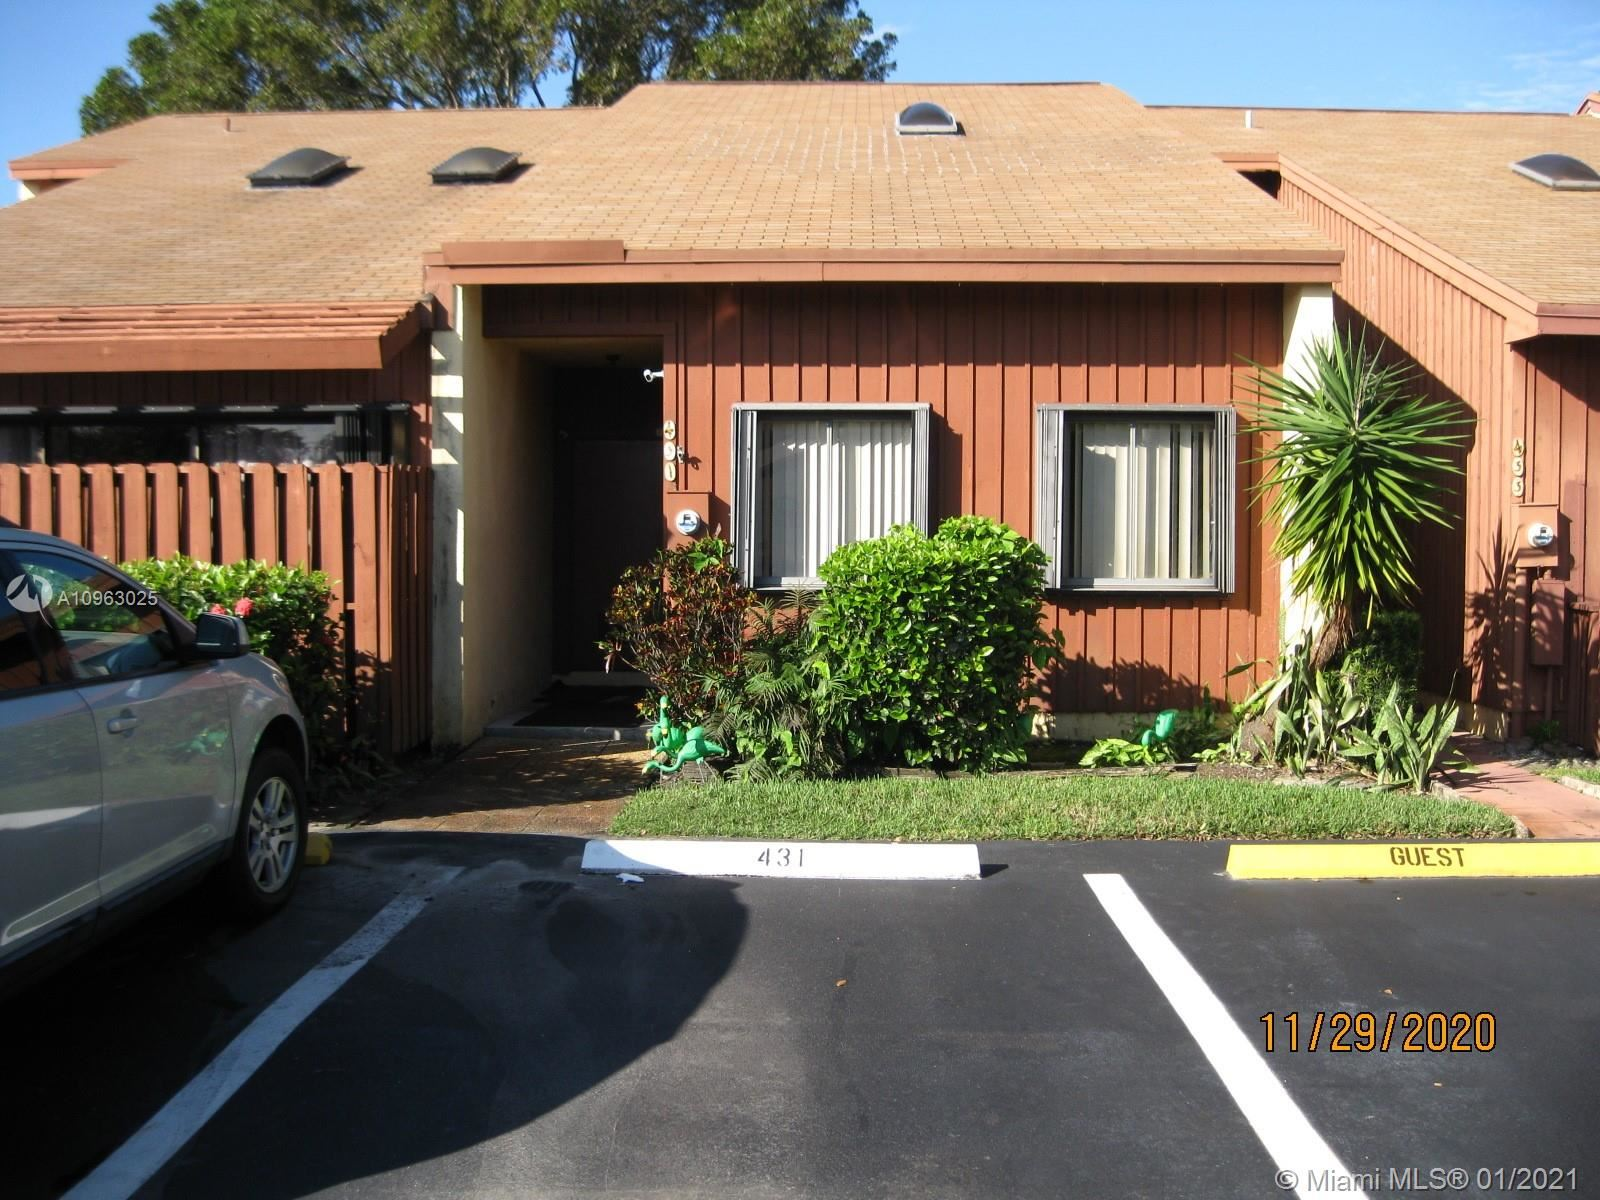 Photo of 431 SE 14th St #431, Dania Beach, FL 33004 (MLS # A10963025)